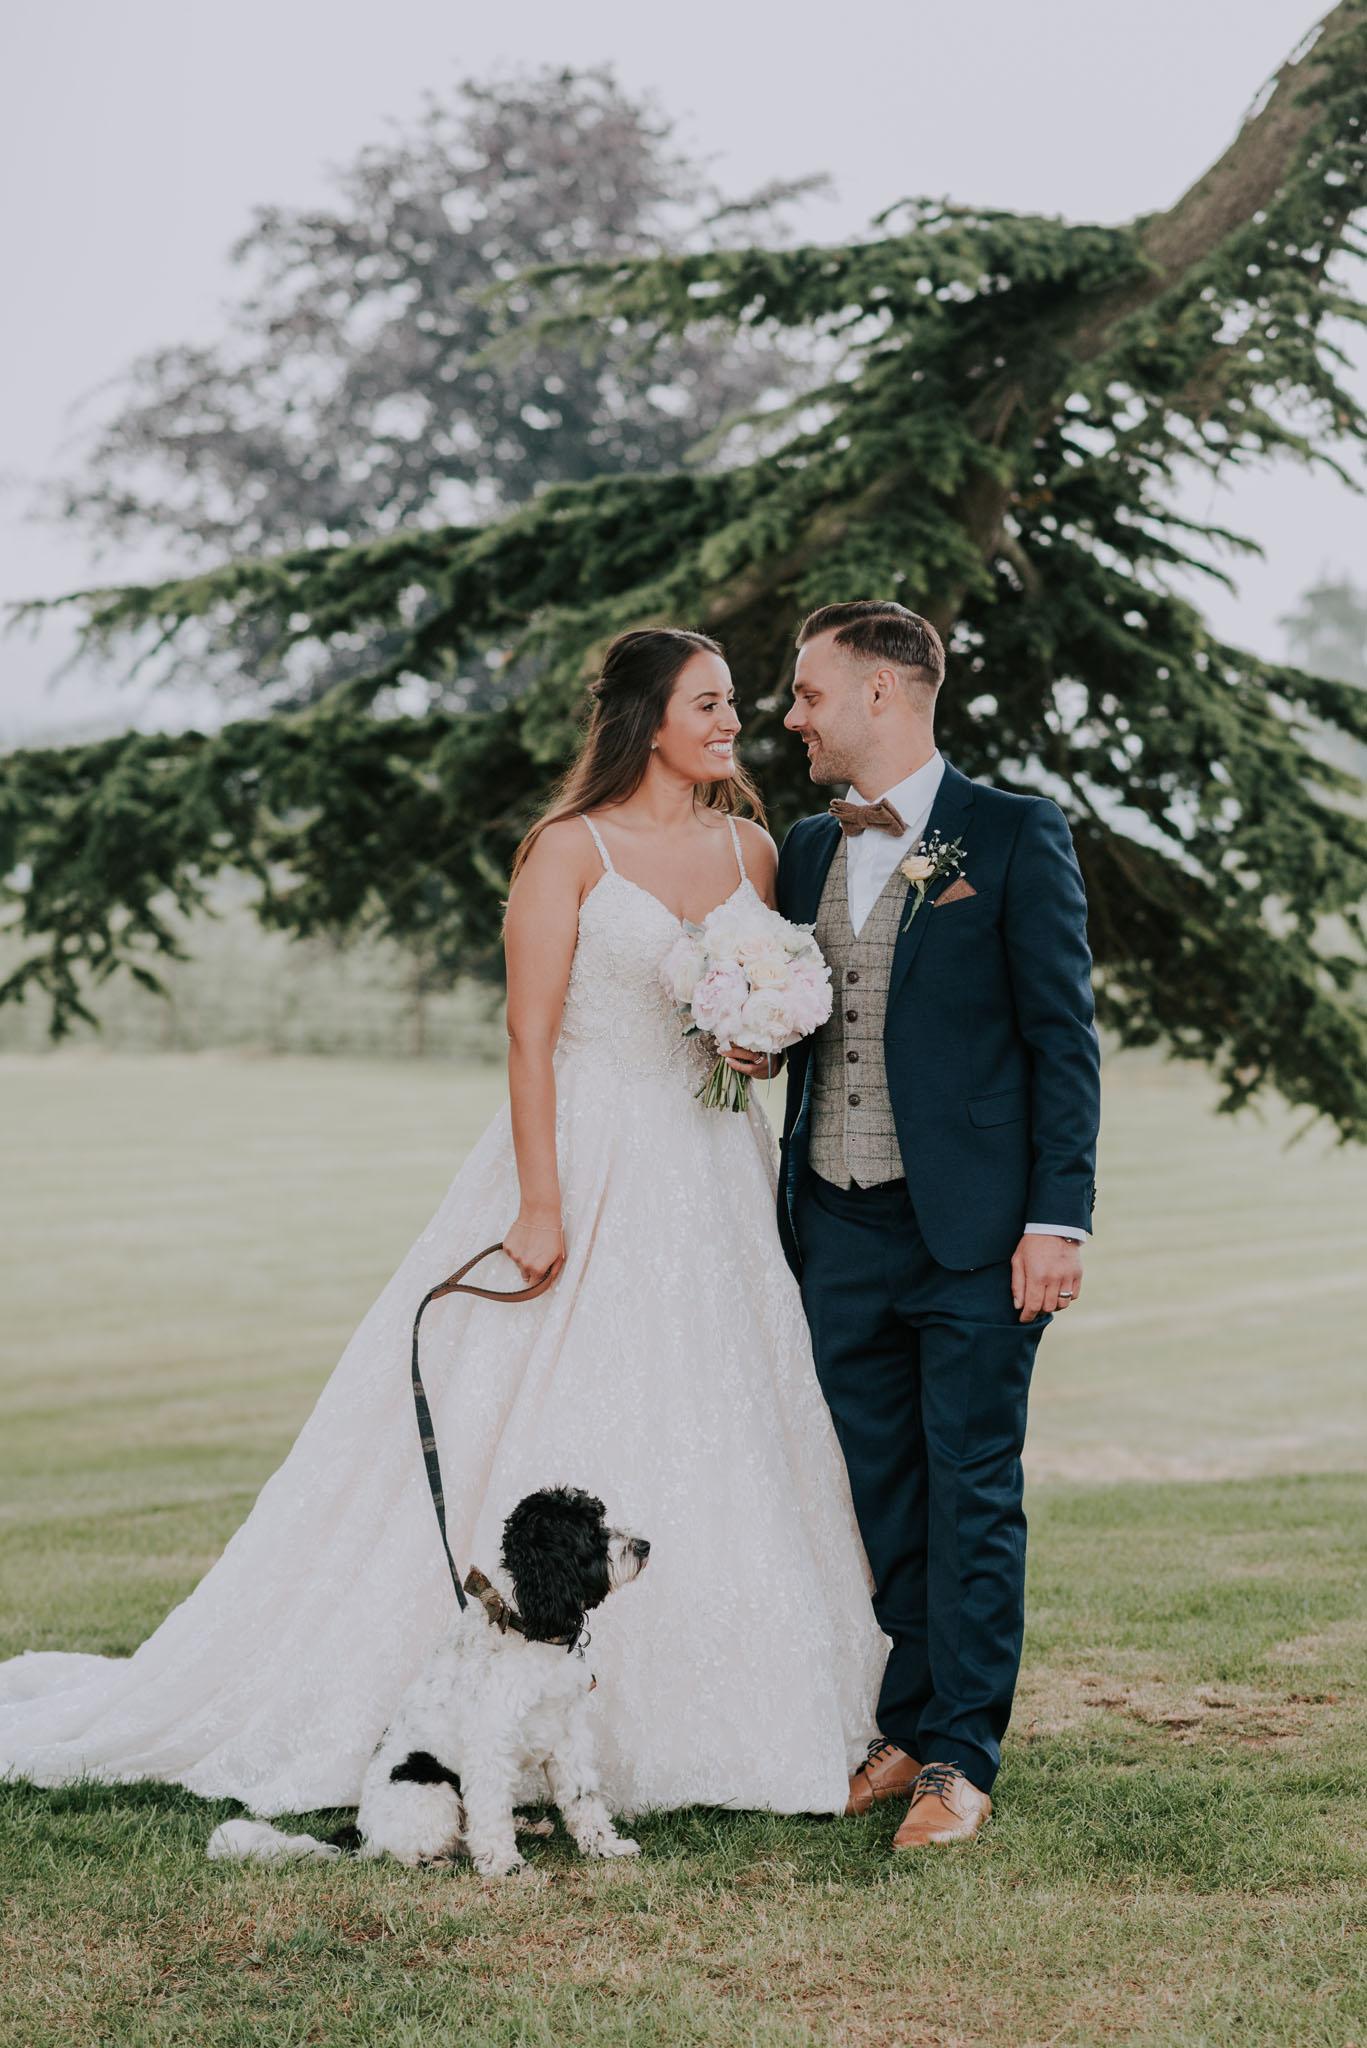 wedding-photographer-glewstone-court-hereford-scott-stockwell-photography340.jpg